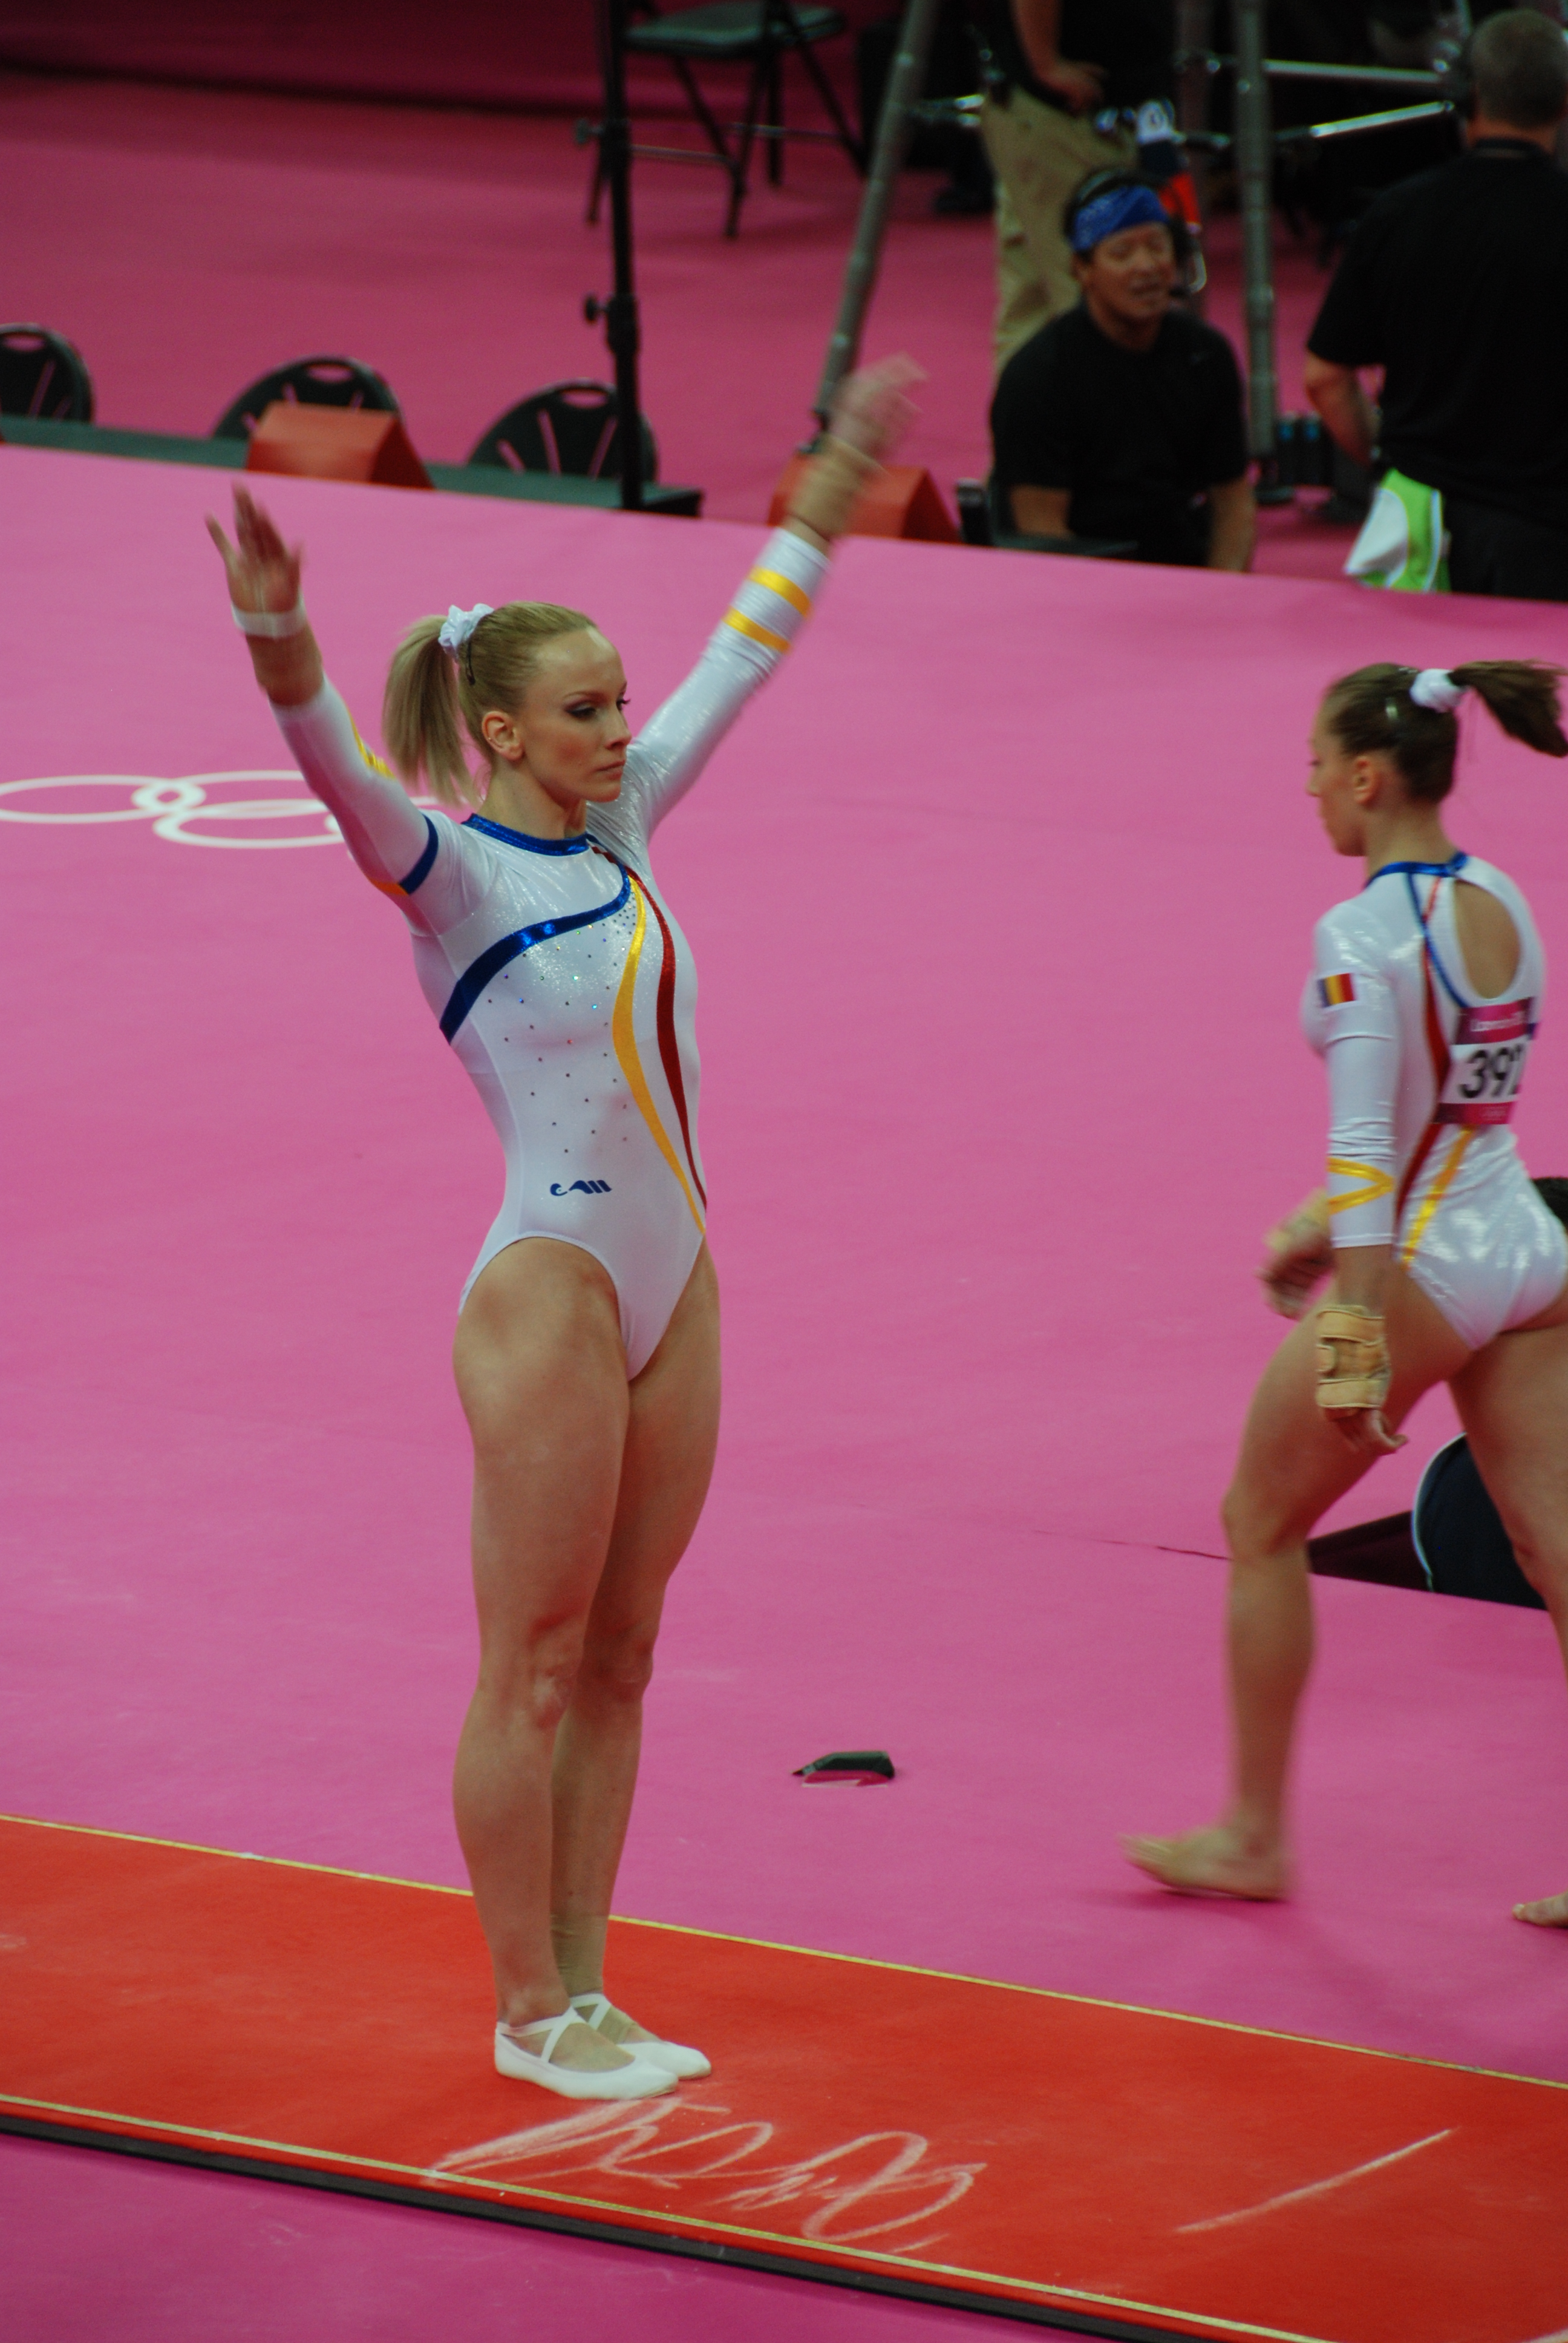 Description Women gymnastics olympics 2012 sandra izbasa 02.jpg